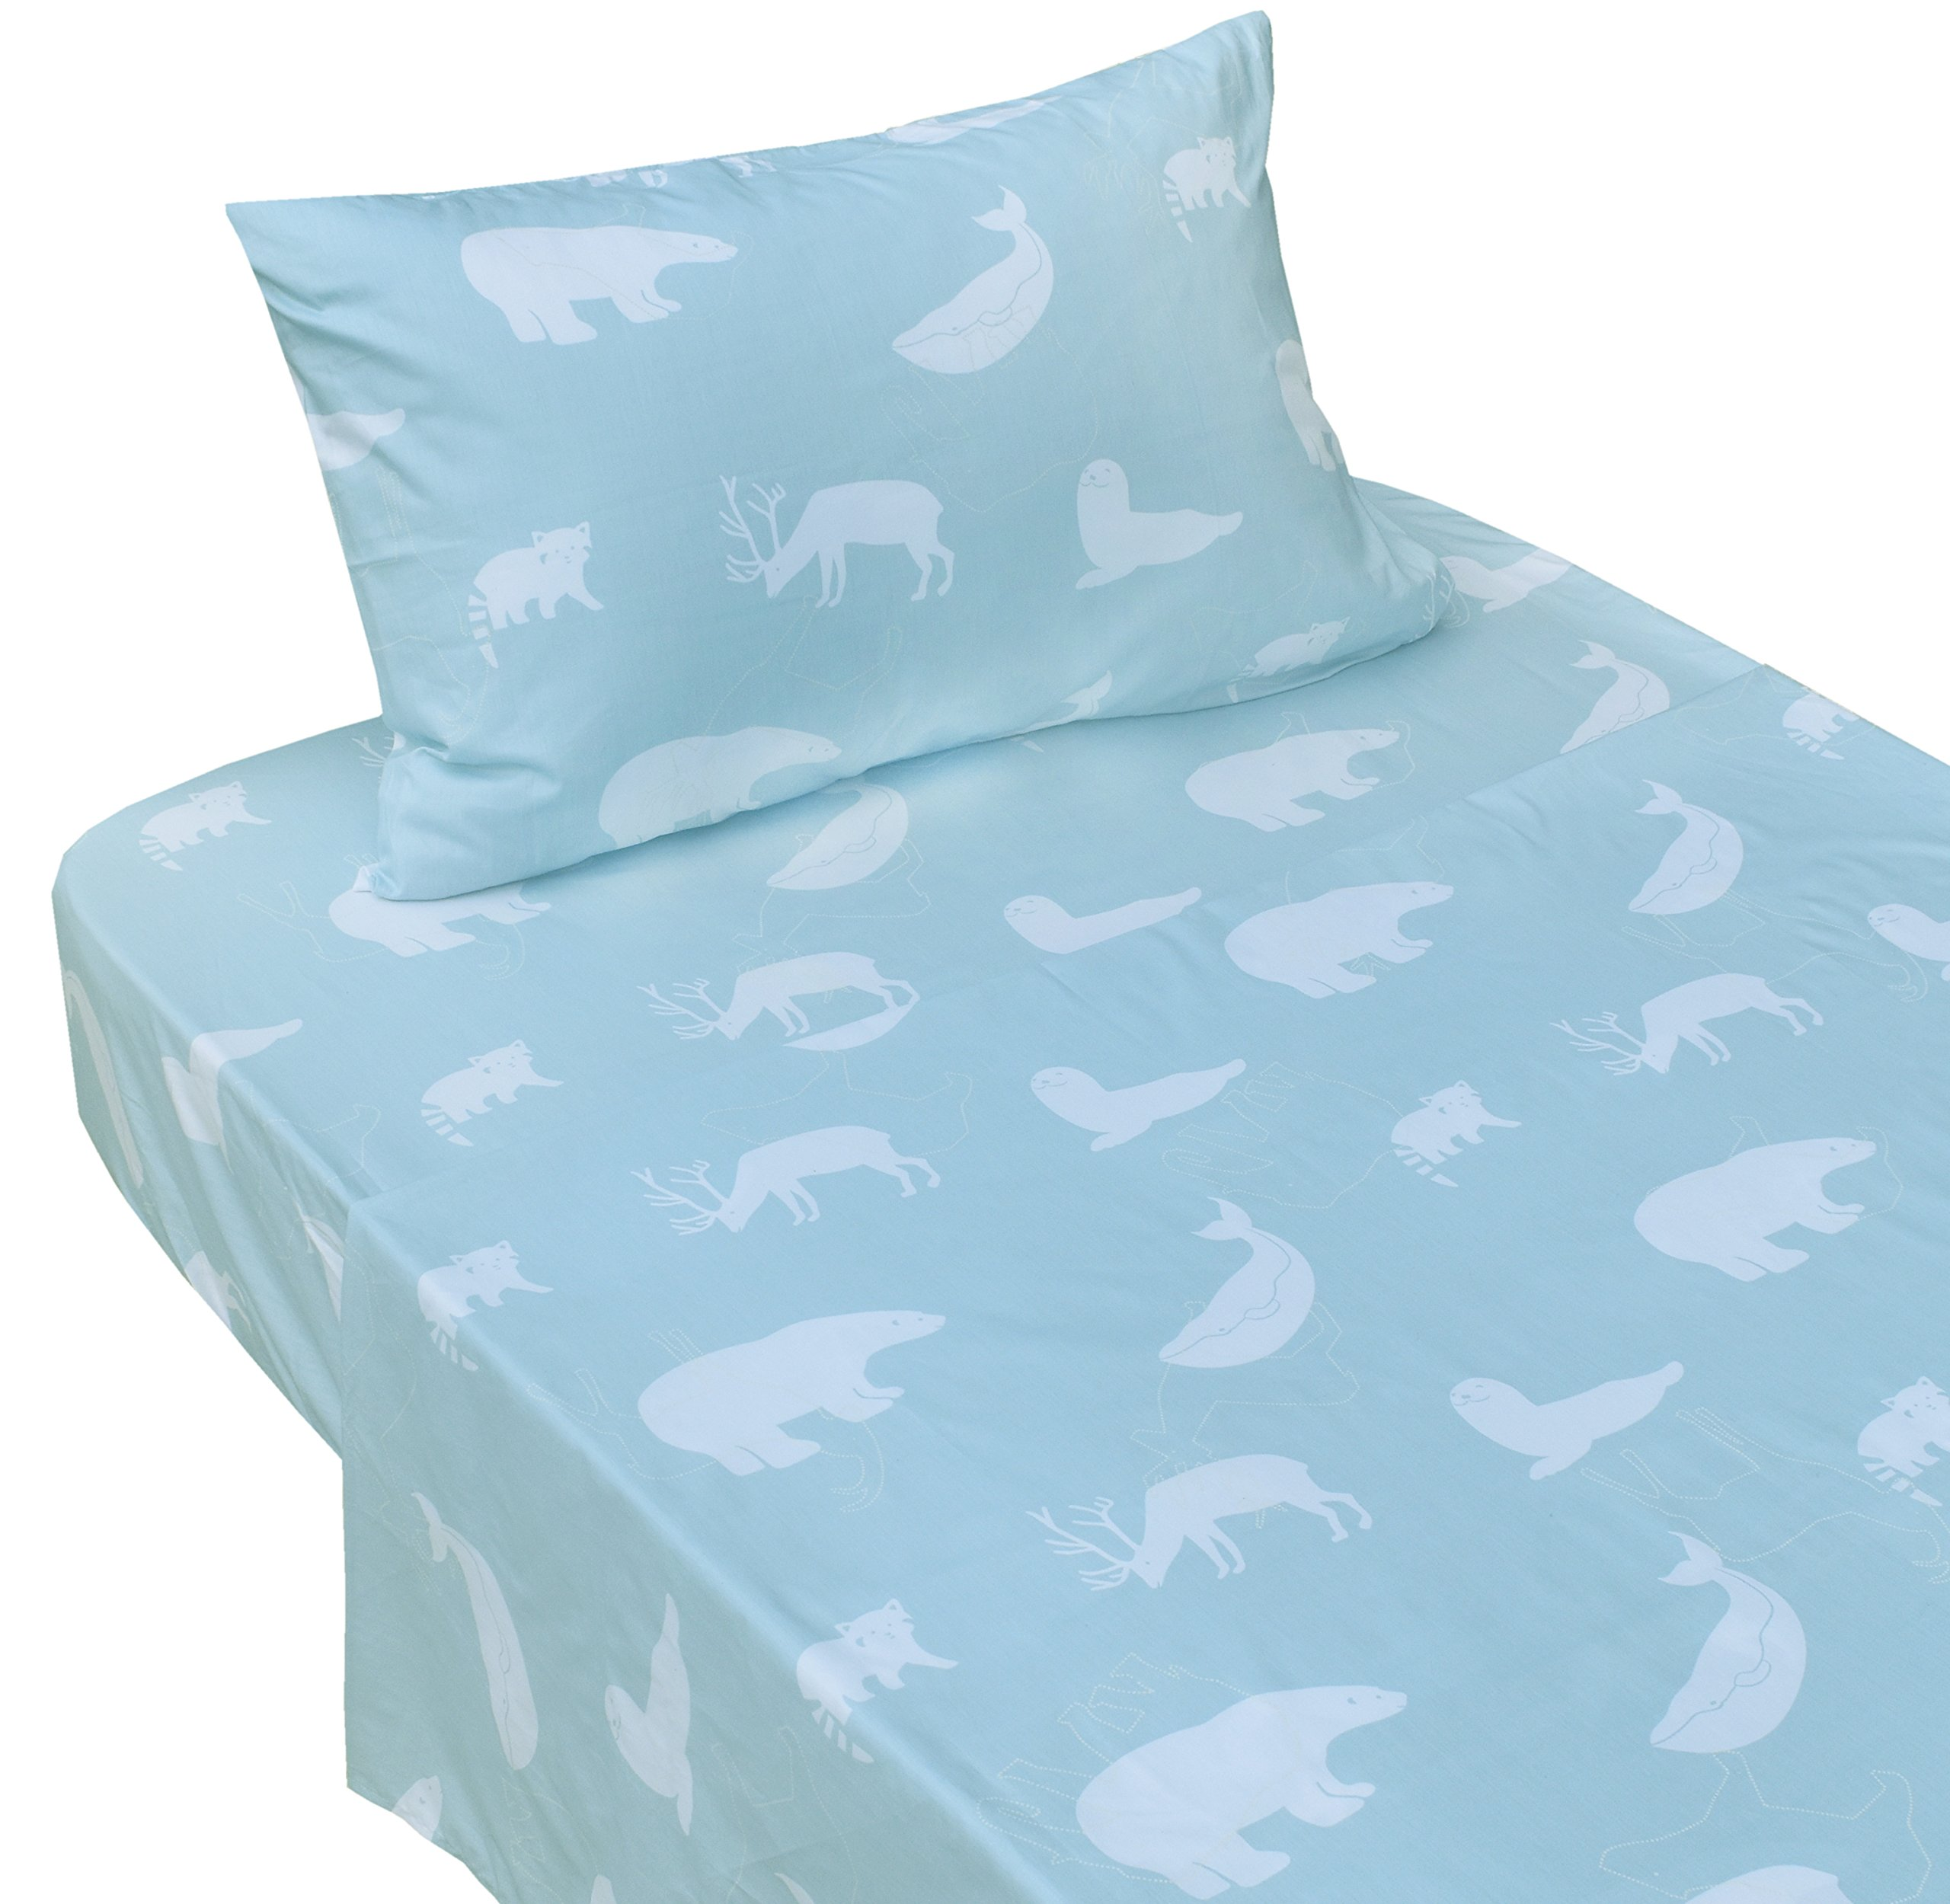 J-pinno Whale Elk Raccoon Polar Bear Blue Printed Twin Sheet Set for Kids Boy Children,100% Cotton, Flat Sheet + Fitted Sheet + Pillowcase Bedding Set (animals2)